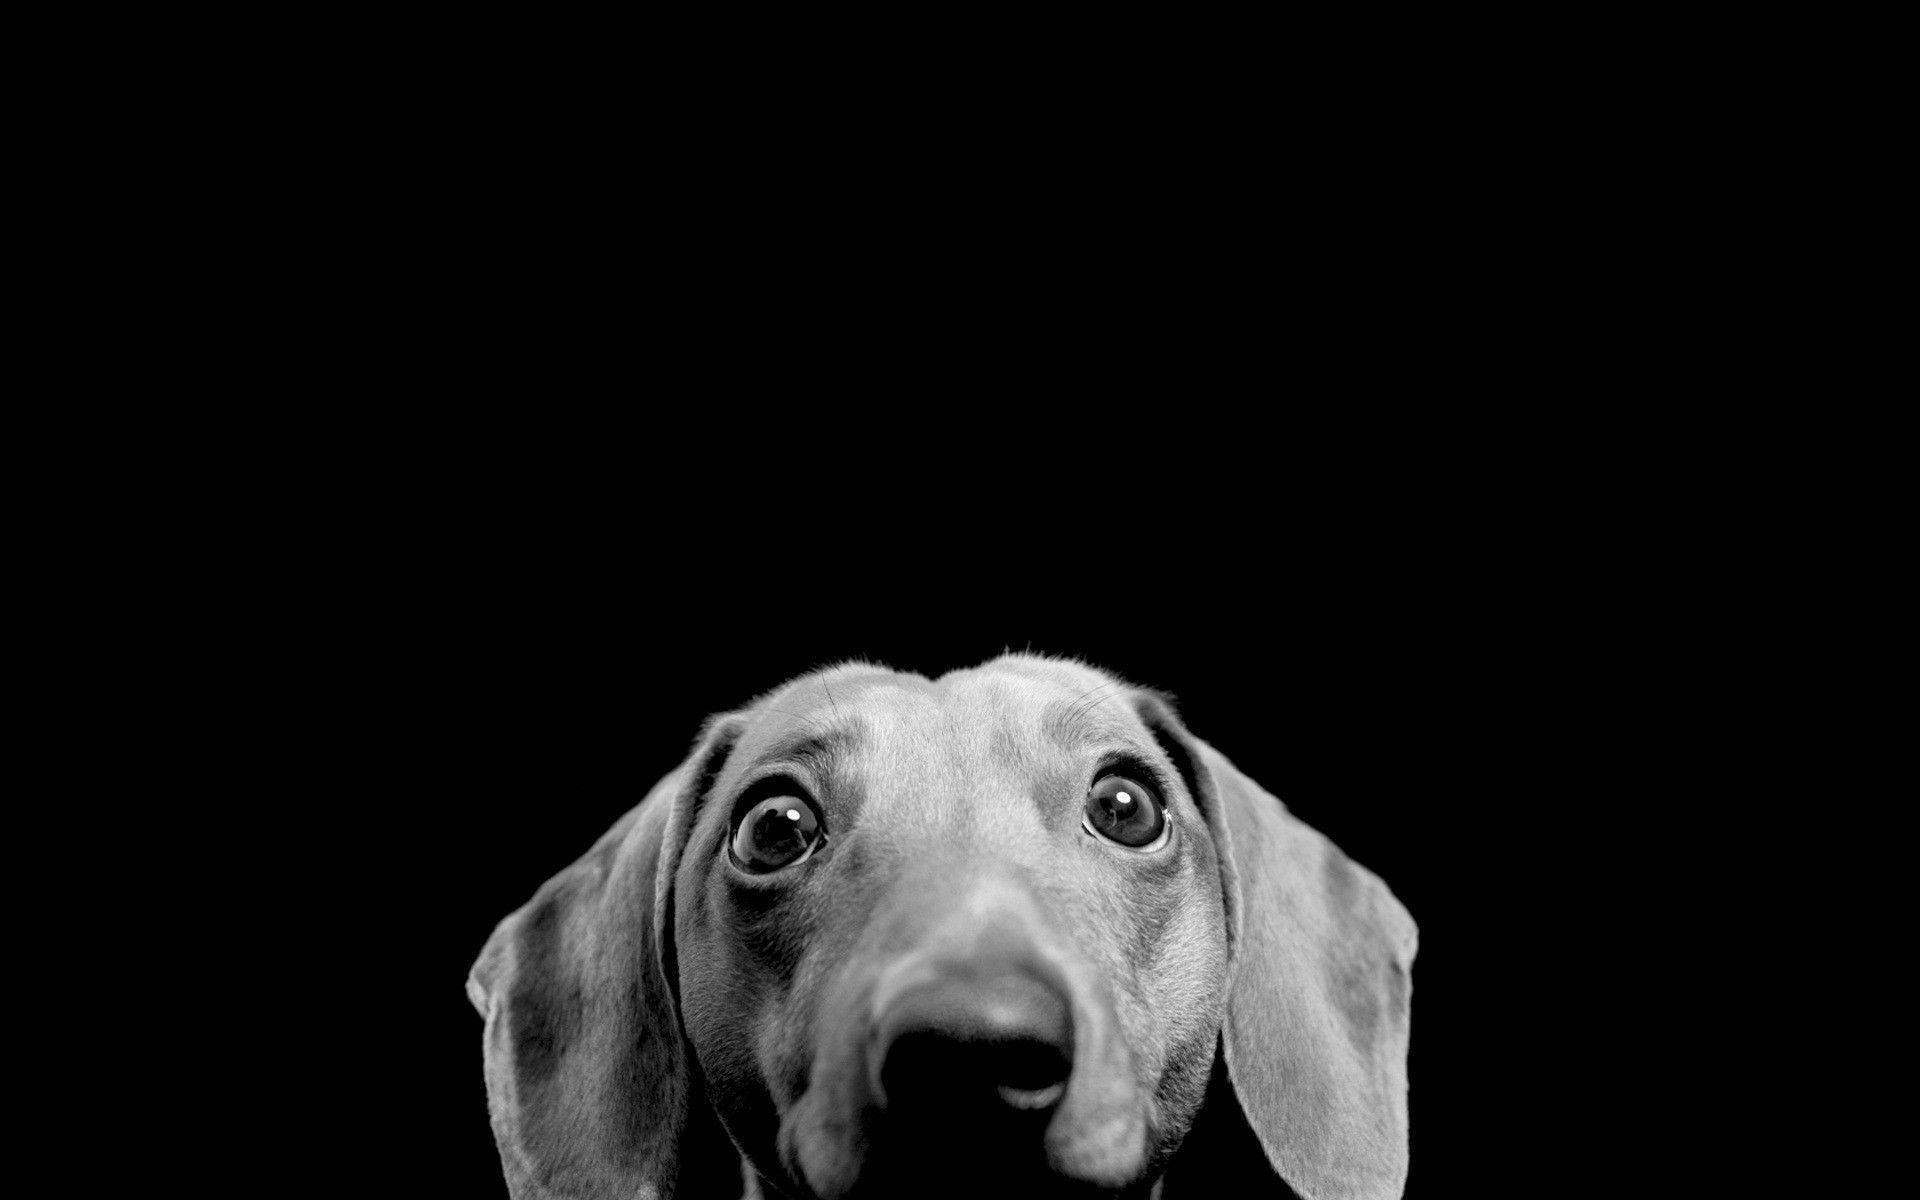 Desktop Wallpaper Hd 3d Full Screen Baby Cute Peeking Dog Hd Desktop Wallpaper Widescreen High